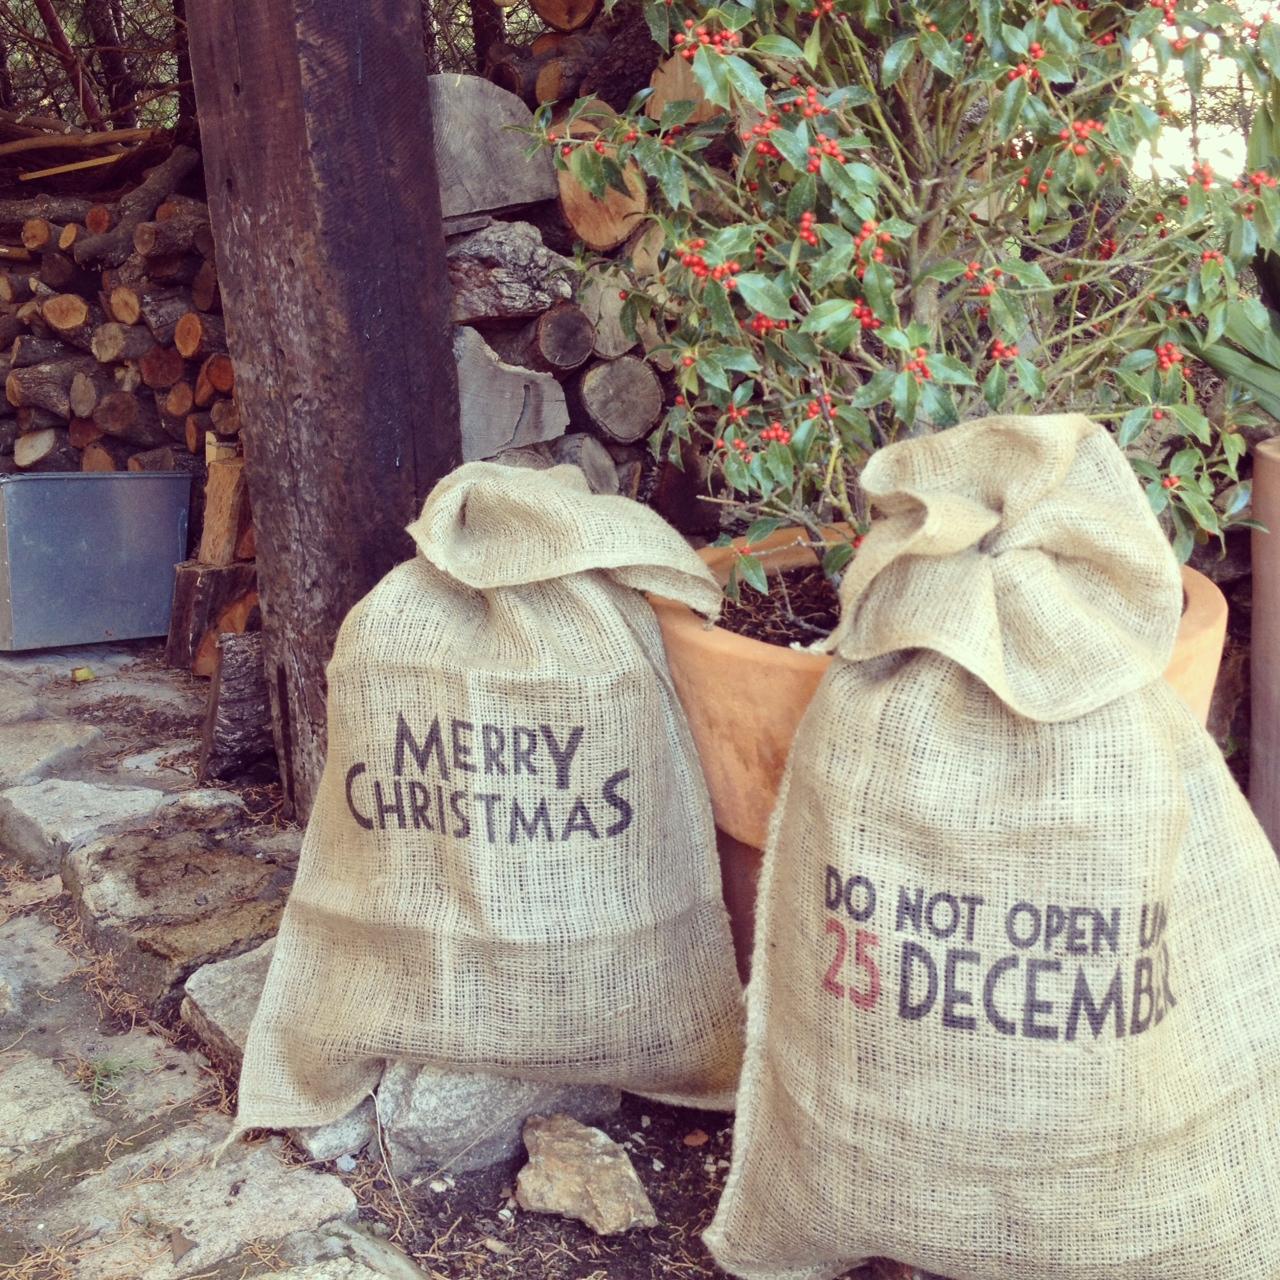 Oui Oui-sacos regalos navidad-merry christmas-no abrir antes del 25 de diciembre-abeto